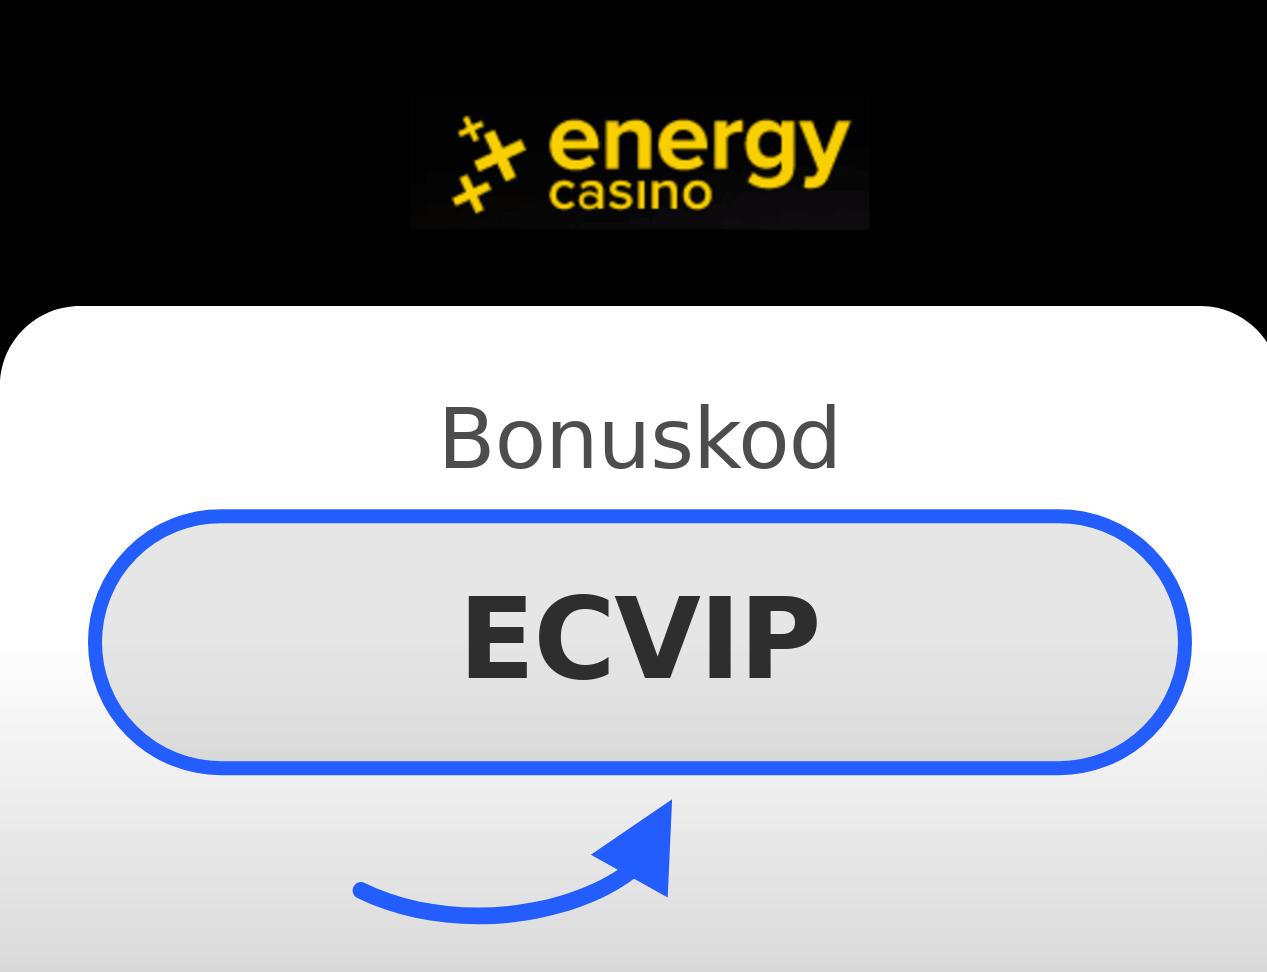 Energy Casino Bonuskod